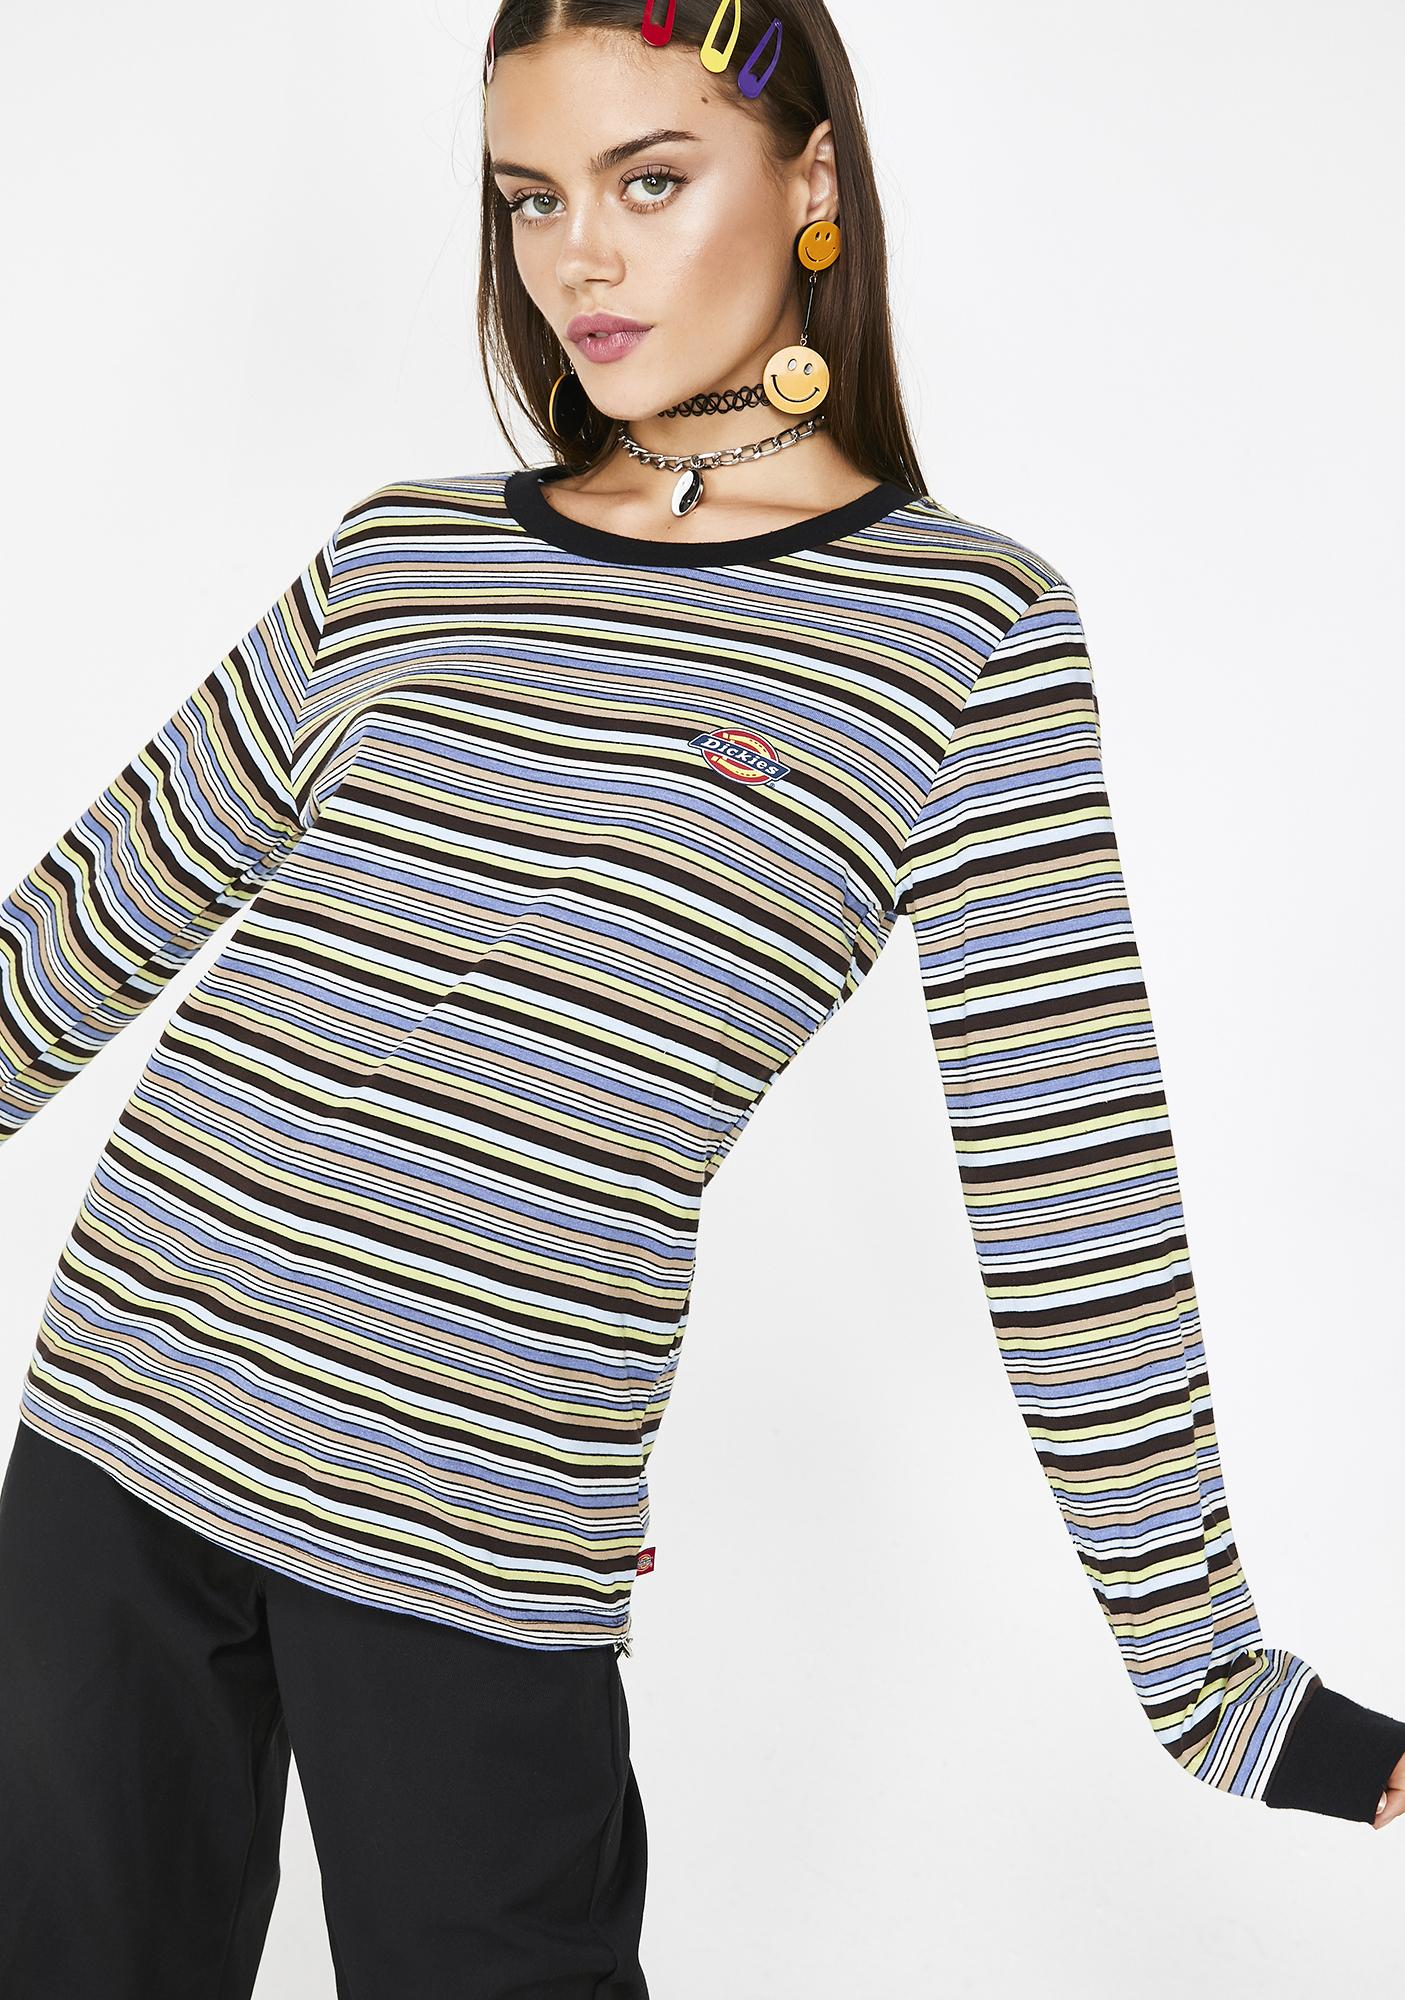 5d0b1a613e4 Dickies Girl Striped Horseshoe Logo Tee | Dolls Kill